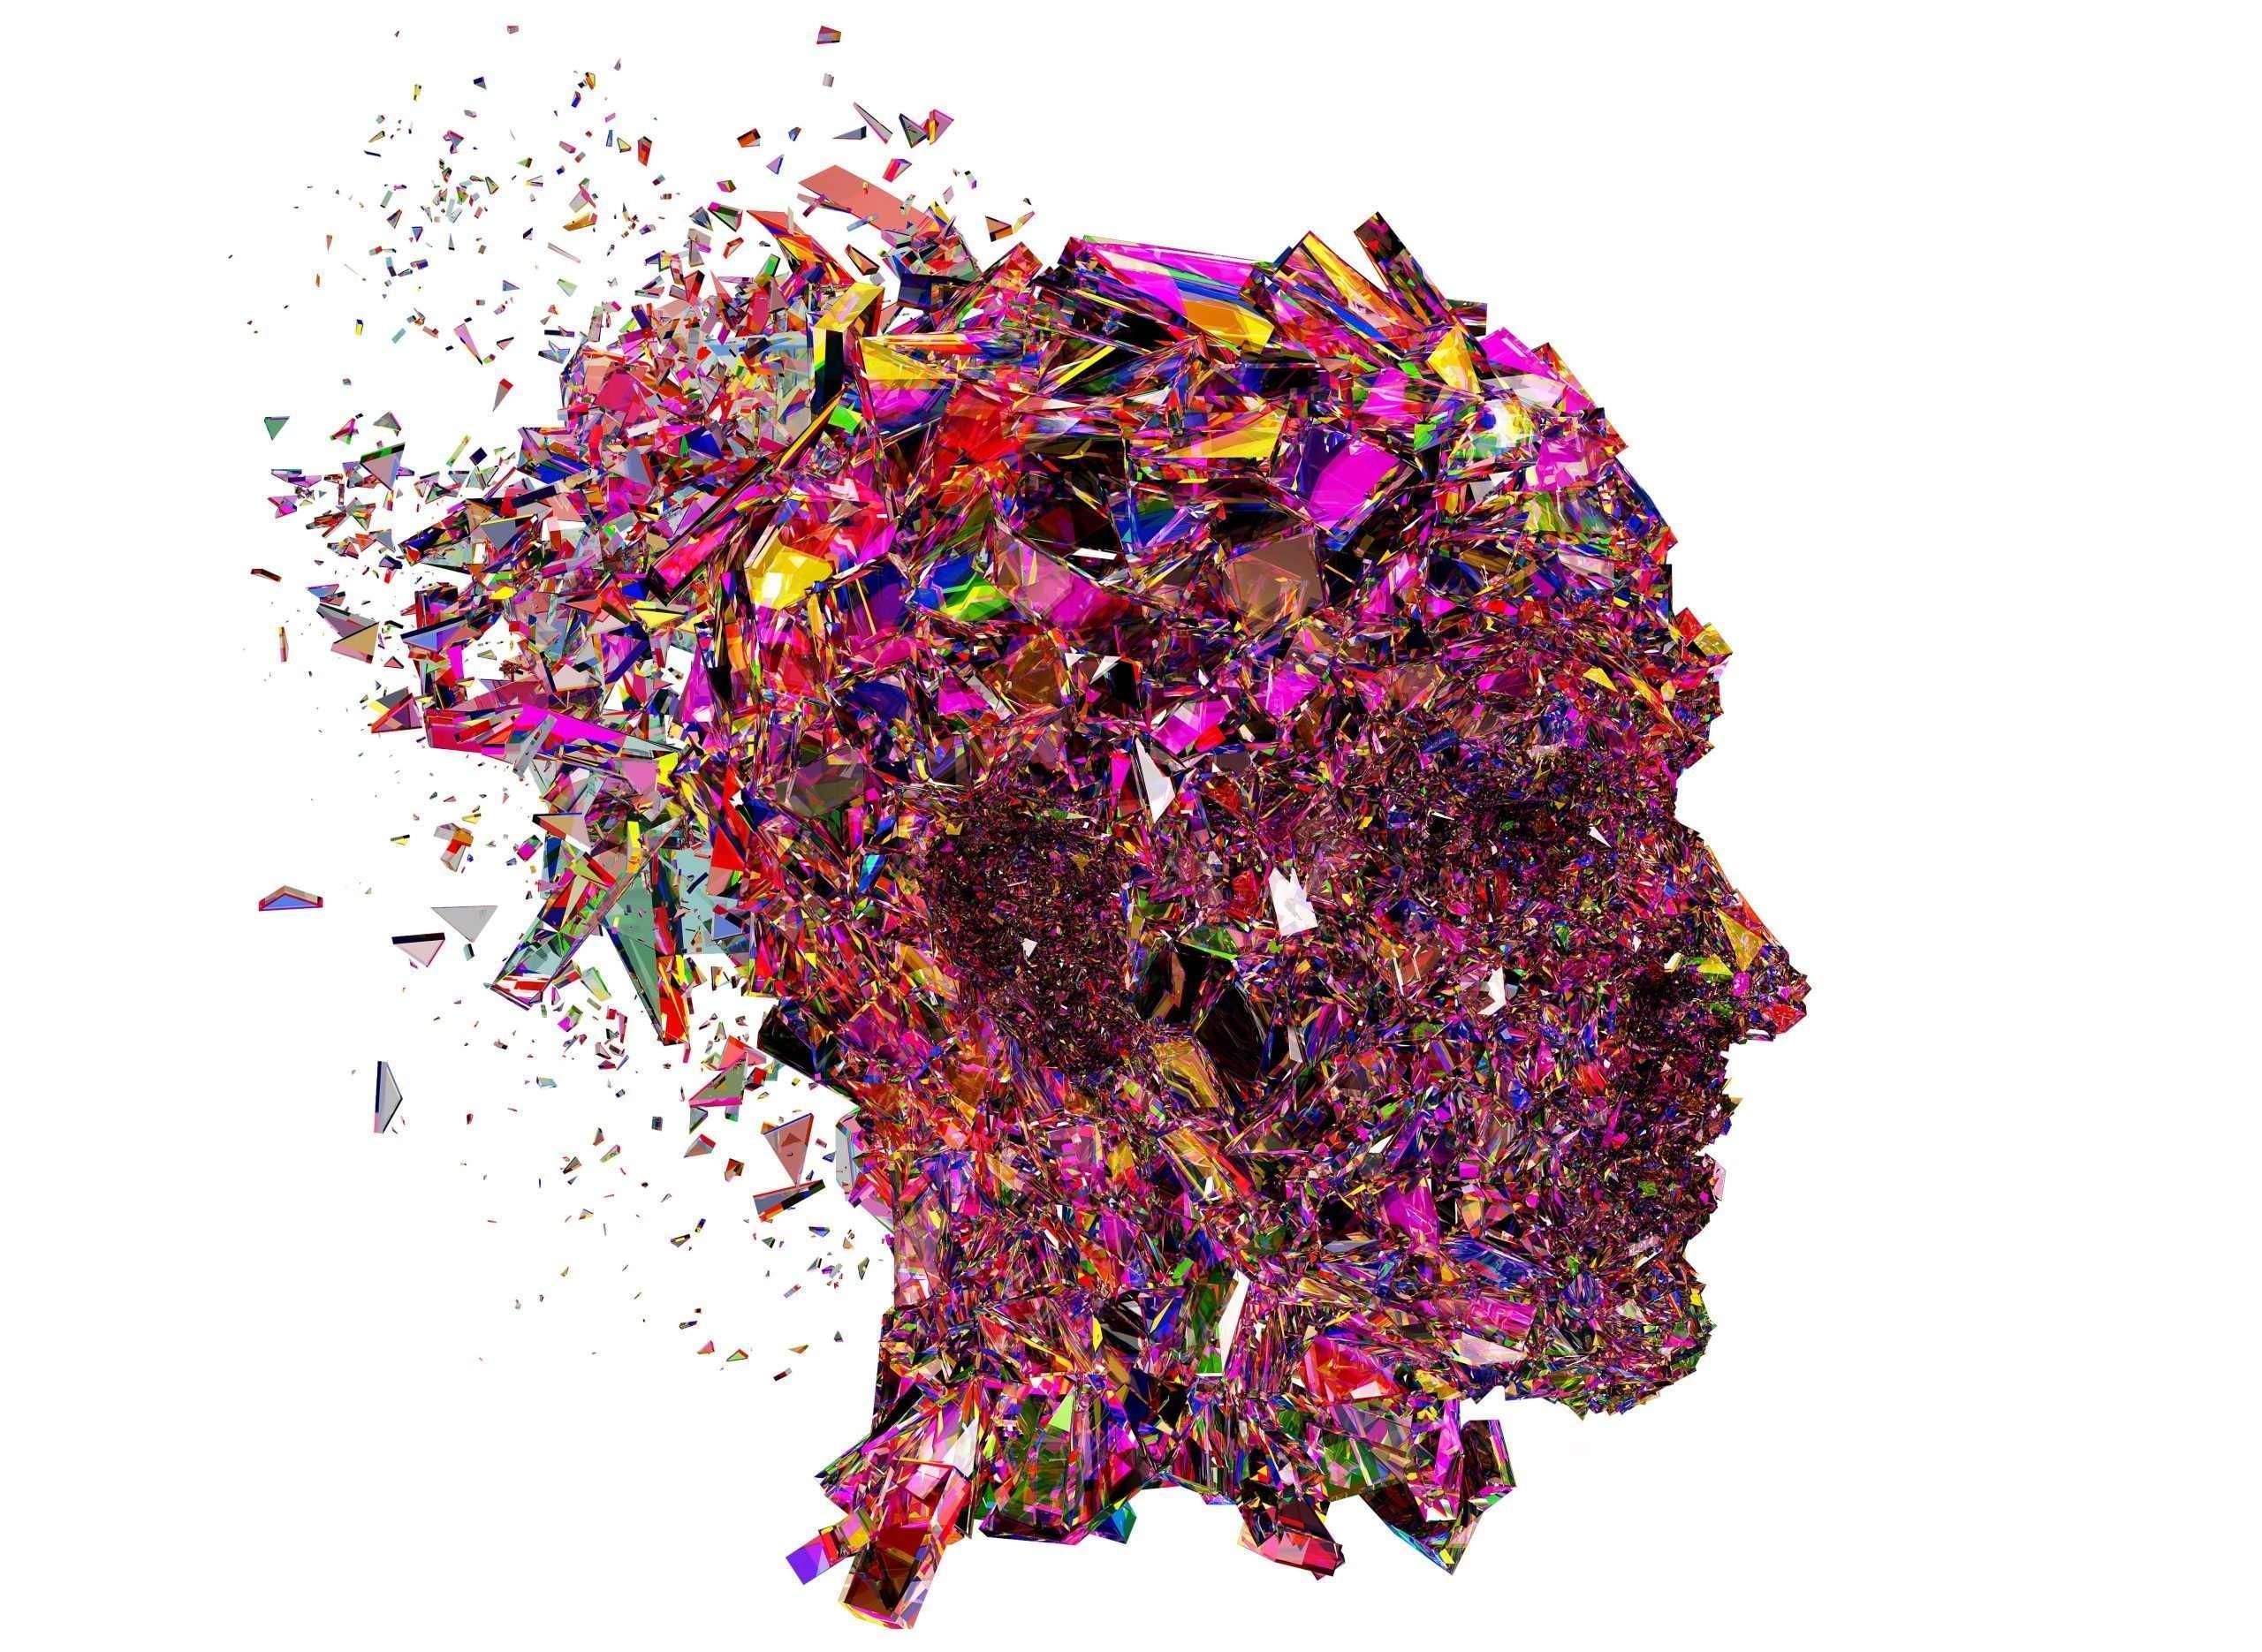 Healing-Trauma-main-event-image